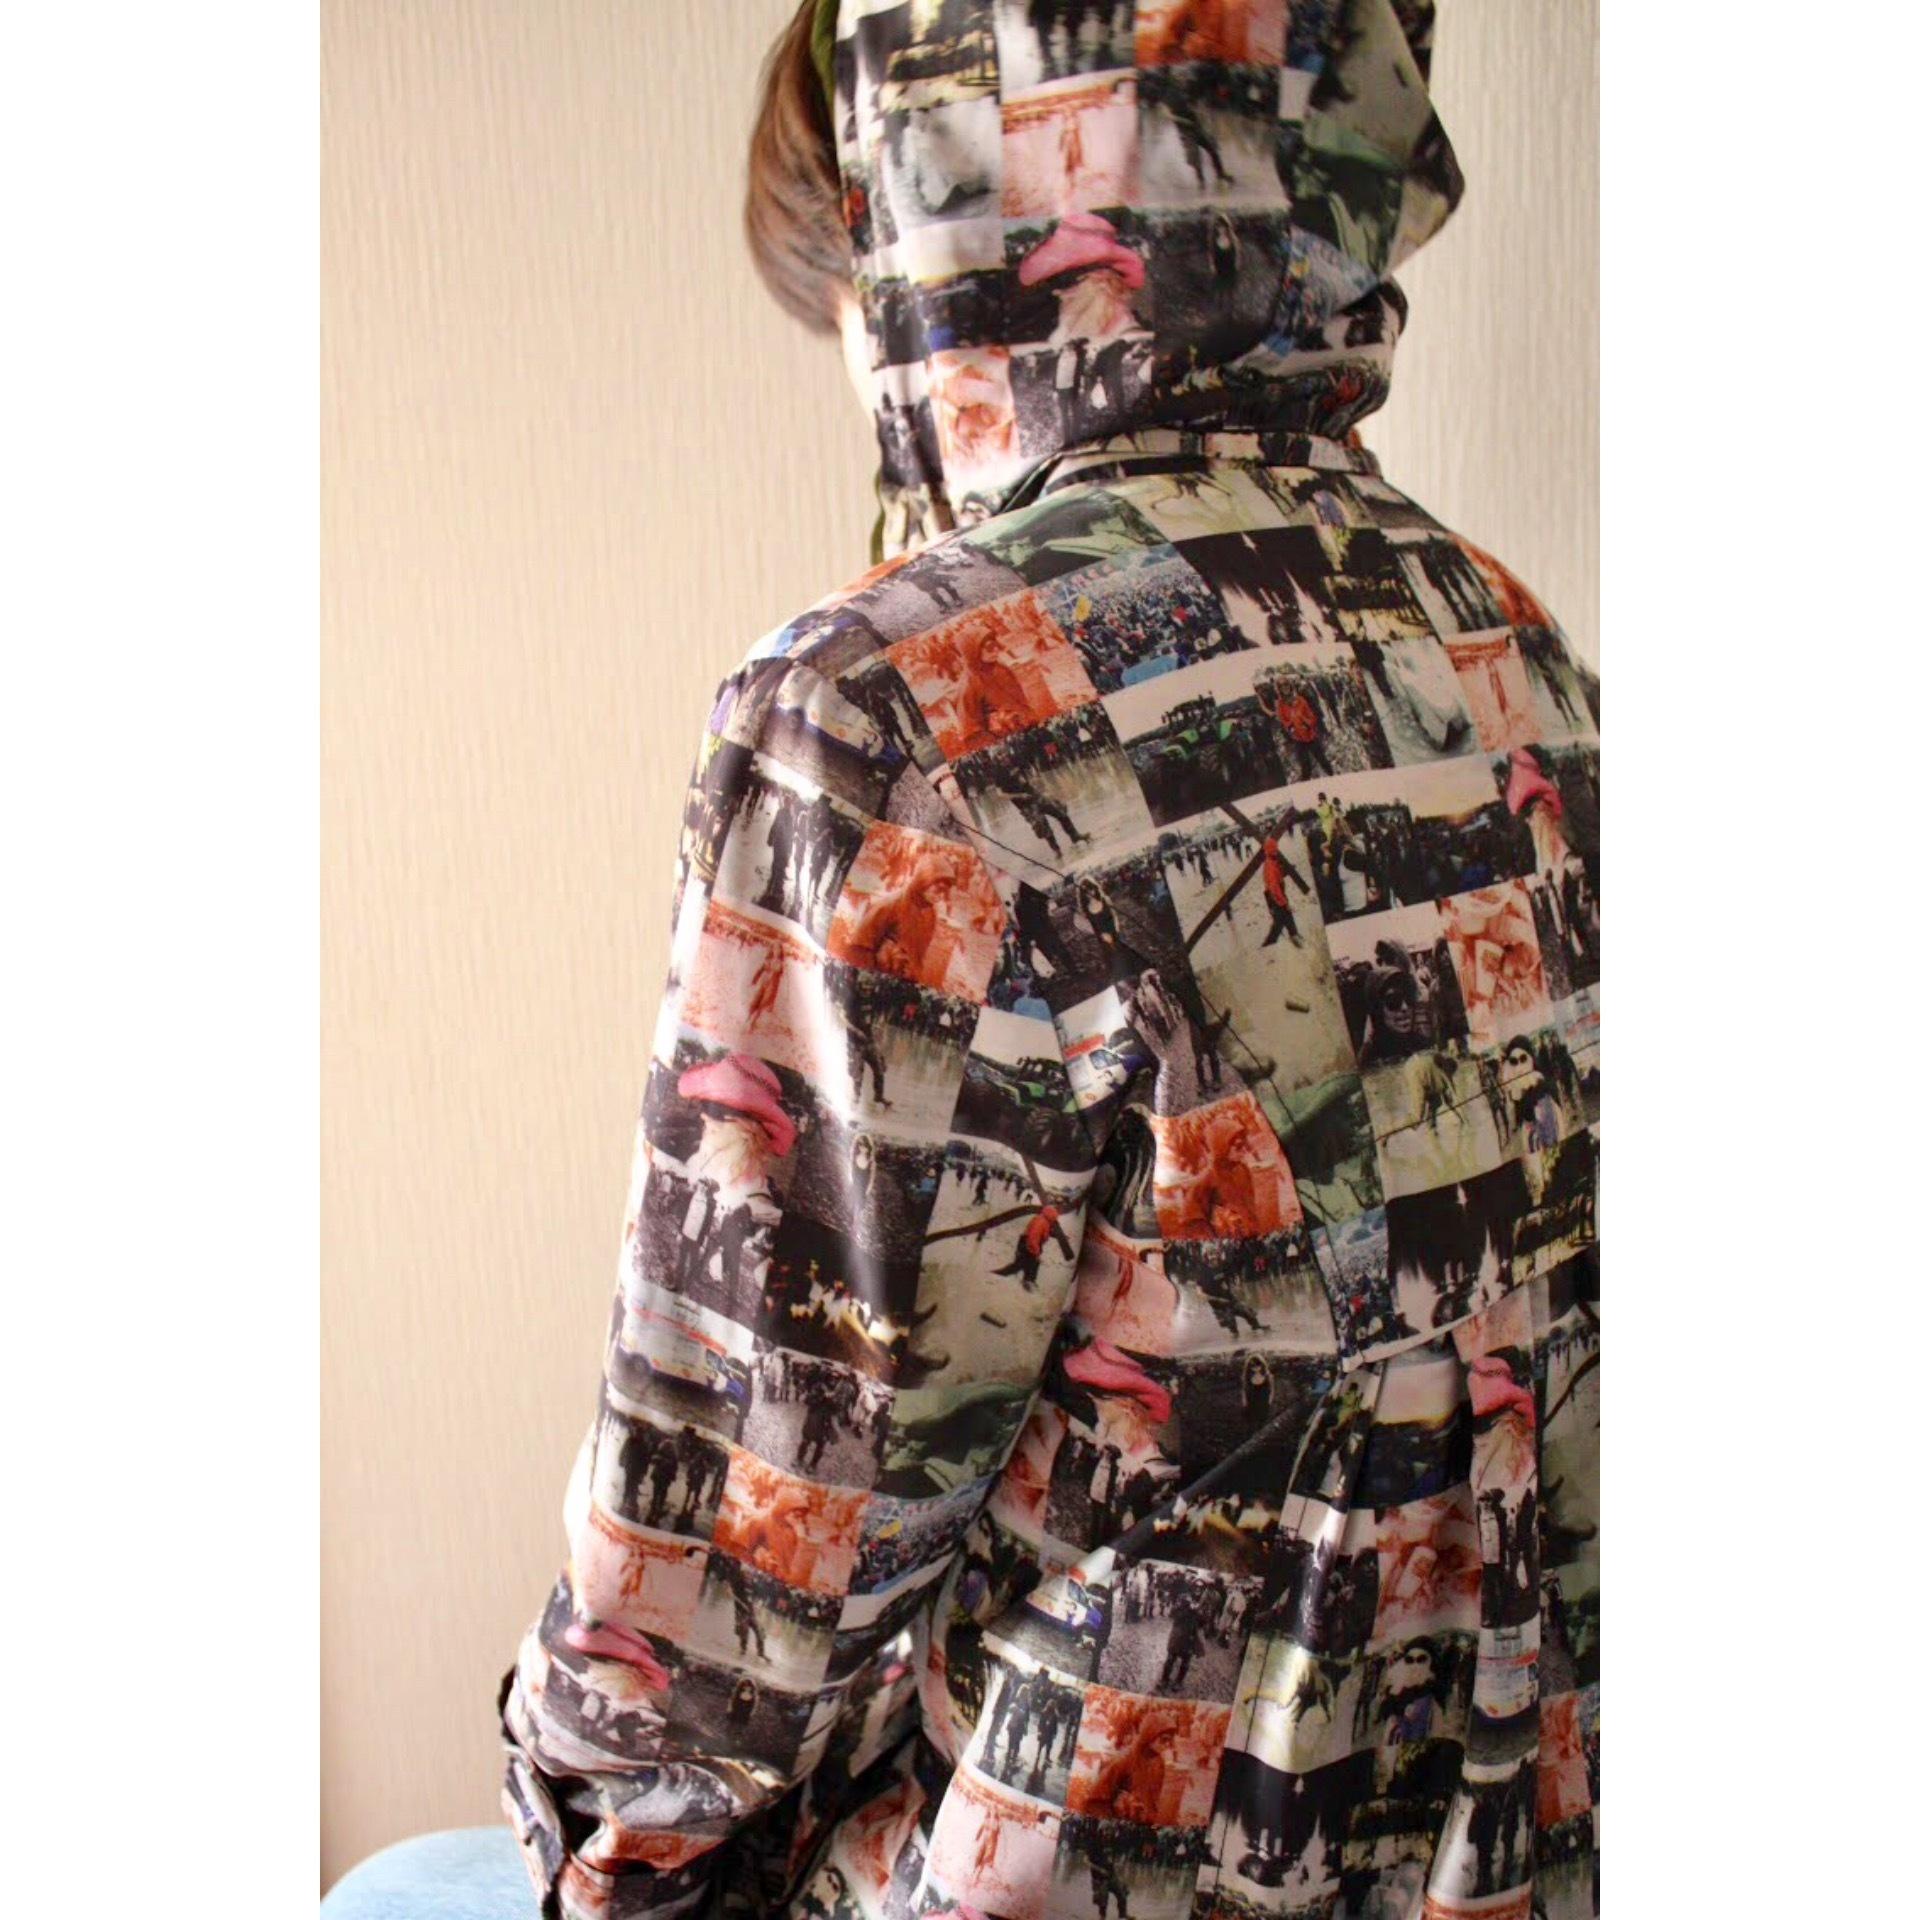 Vintage audience pattern jacket